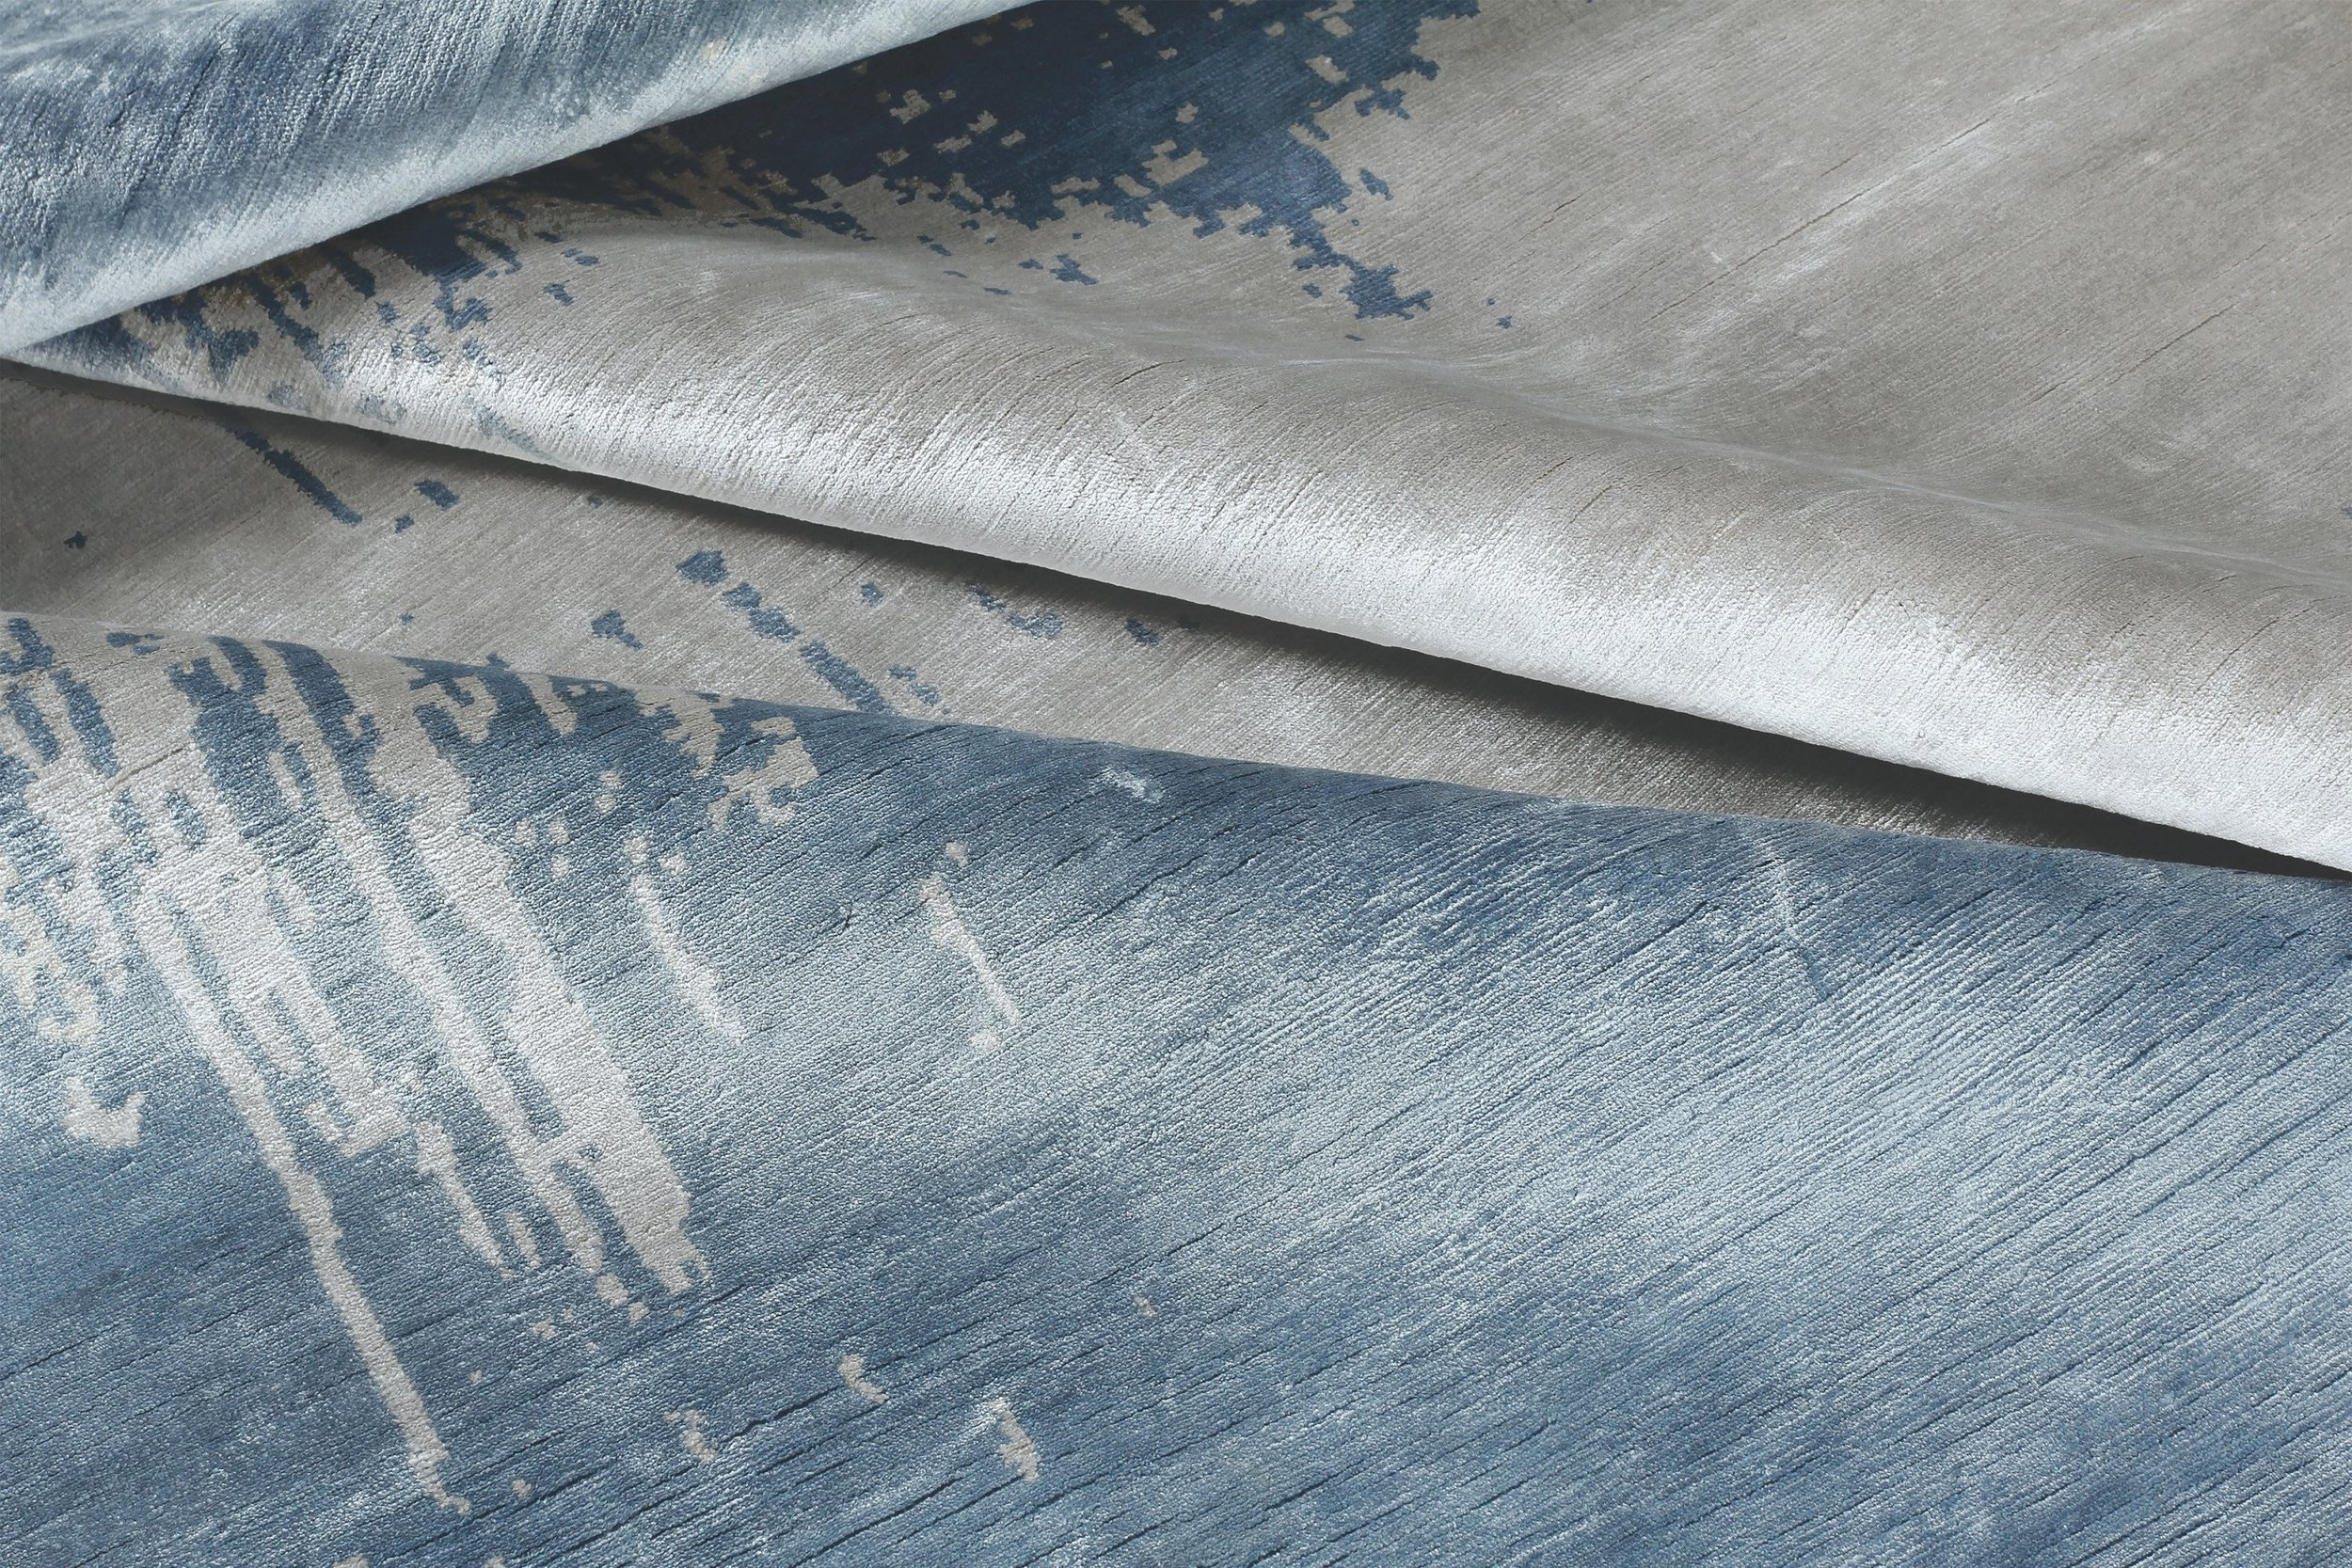 arty-oslo-7cfc50dc-xlarge.jpg